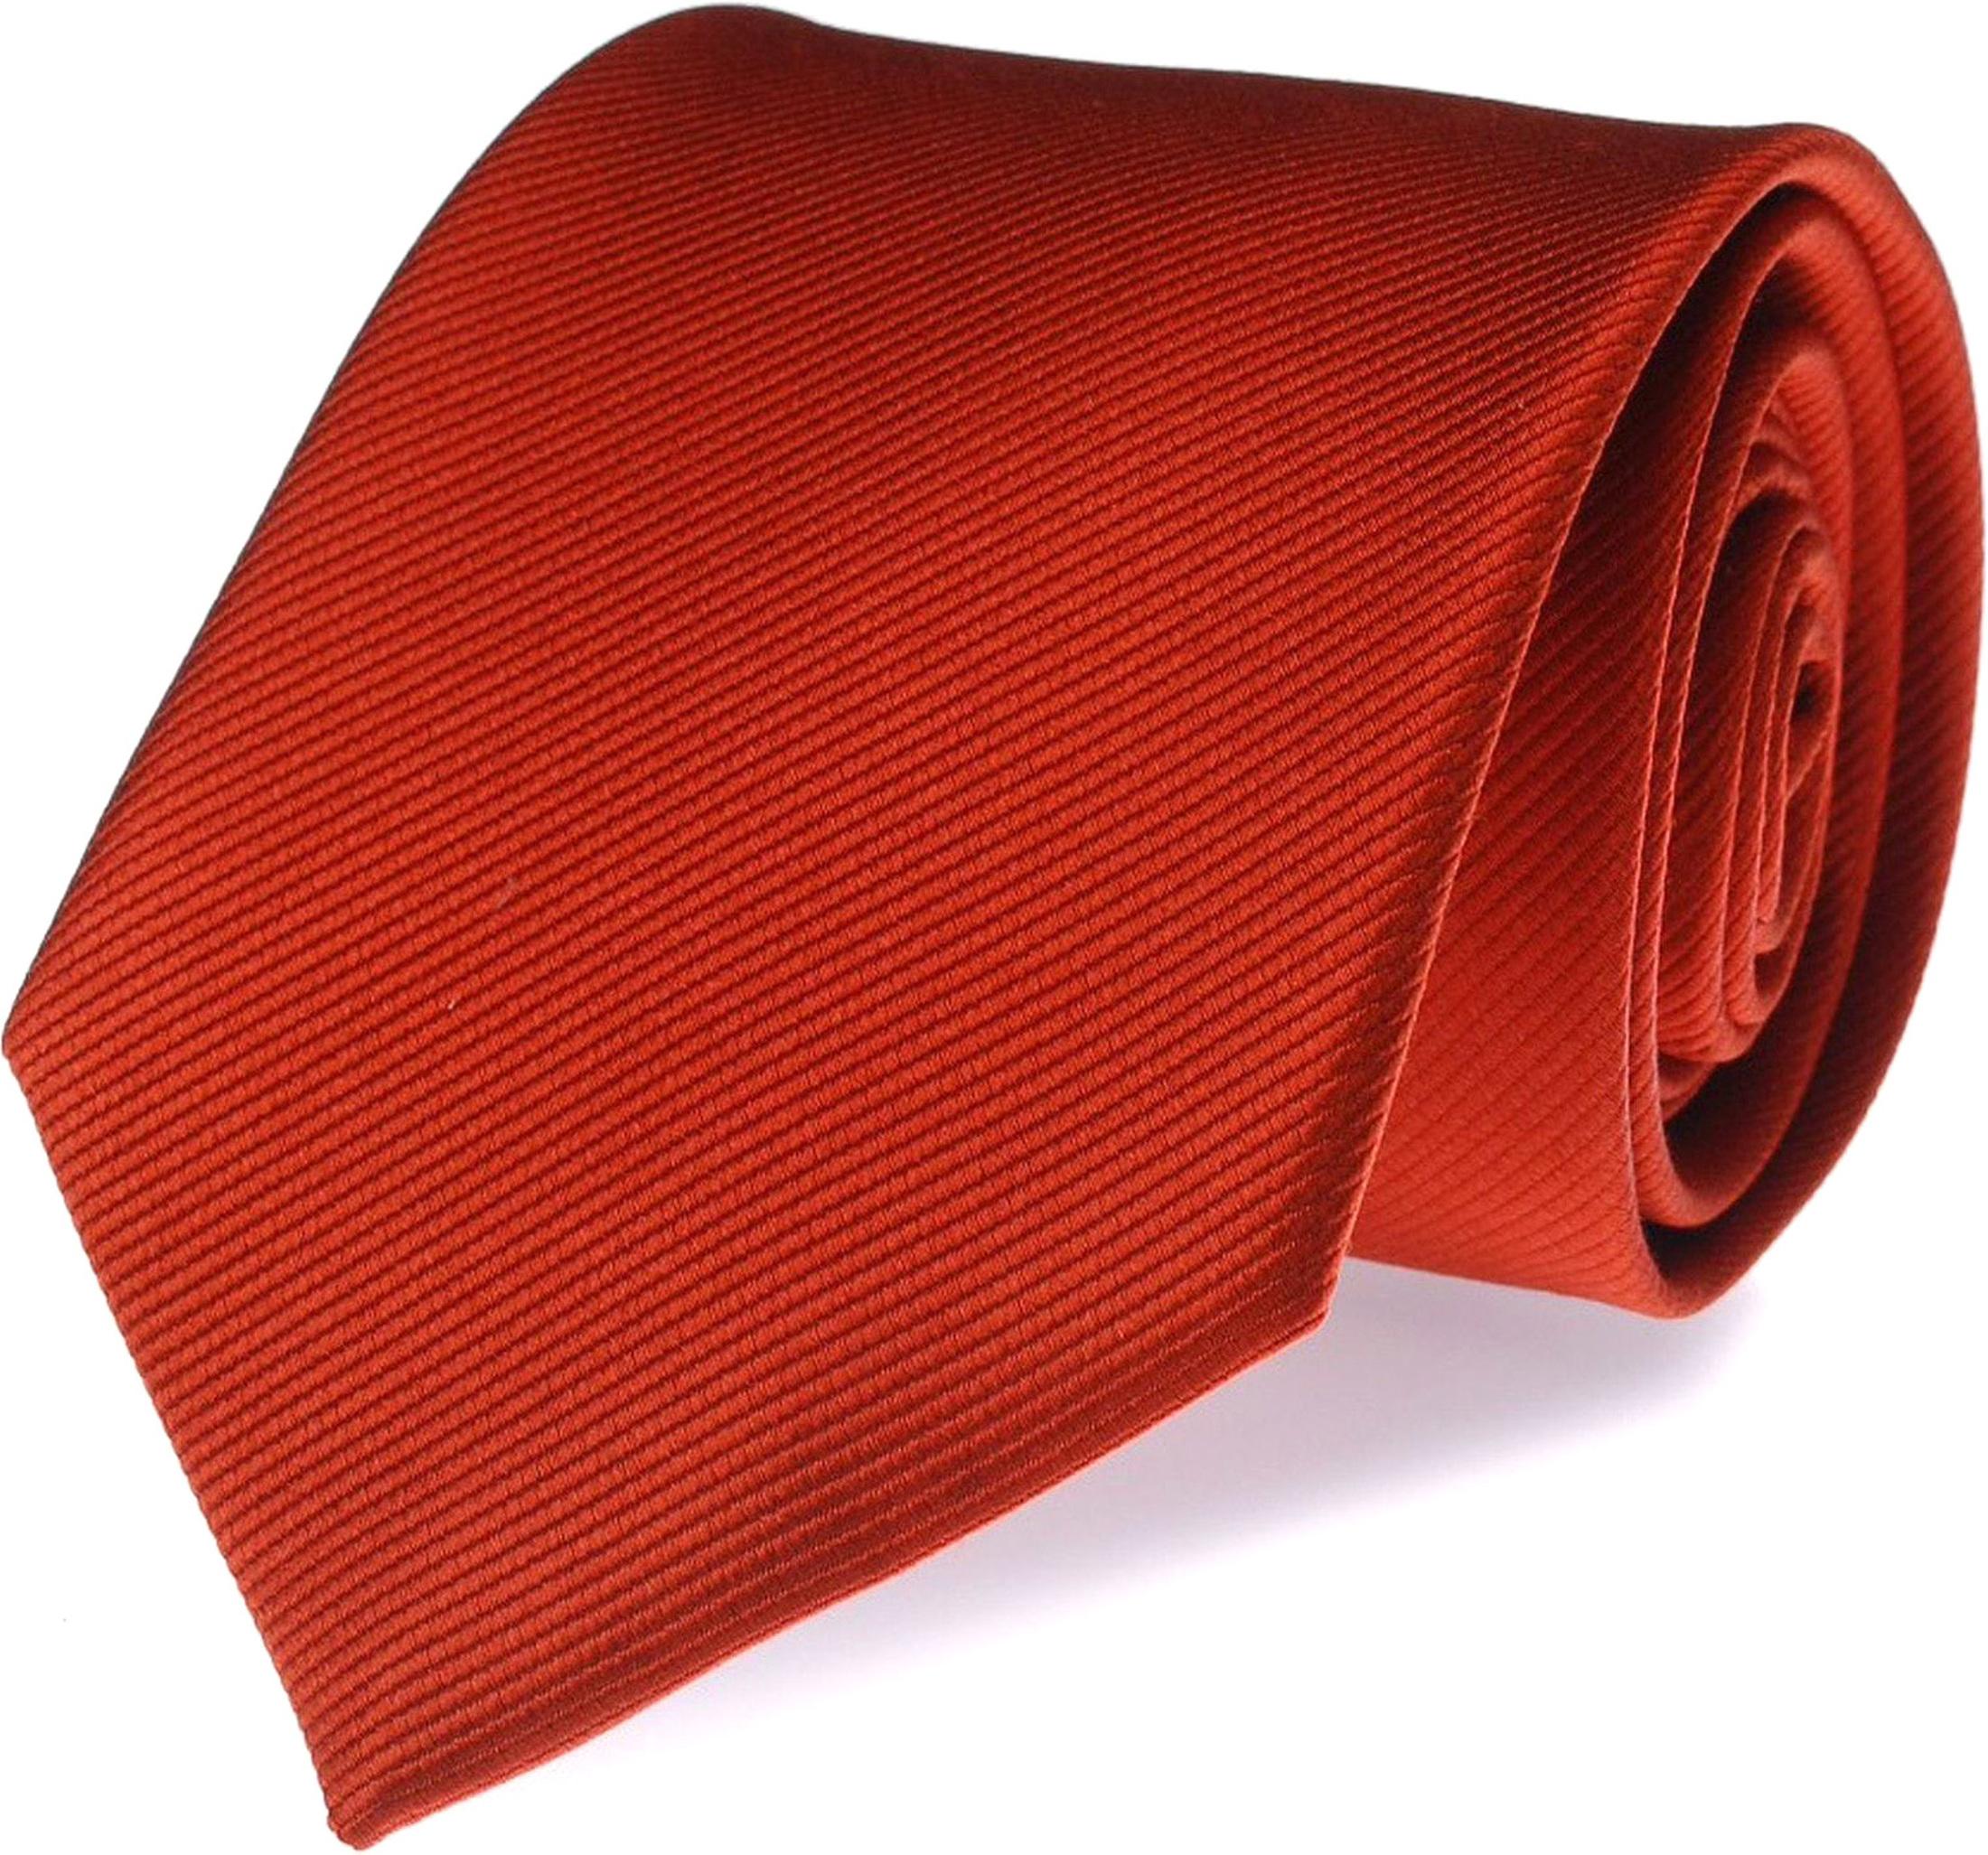 Krawatte Seide Knallrot Uni F34 foto 0